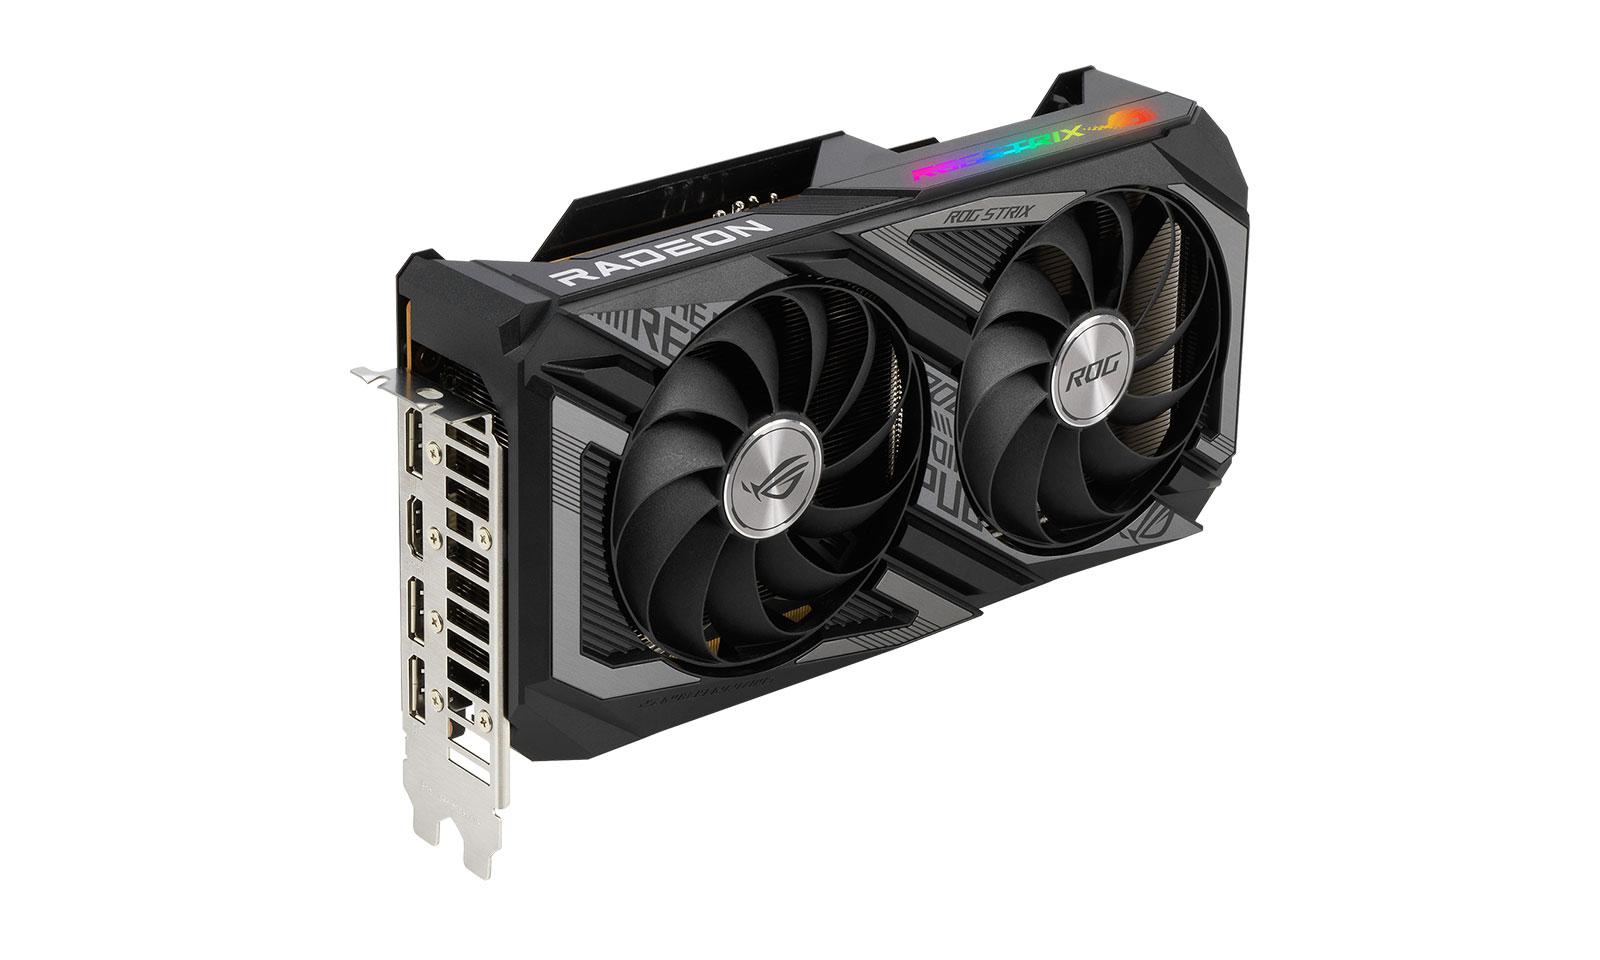 Placa grafică ROG Strix AMD Radeon RX 6600 XT